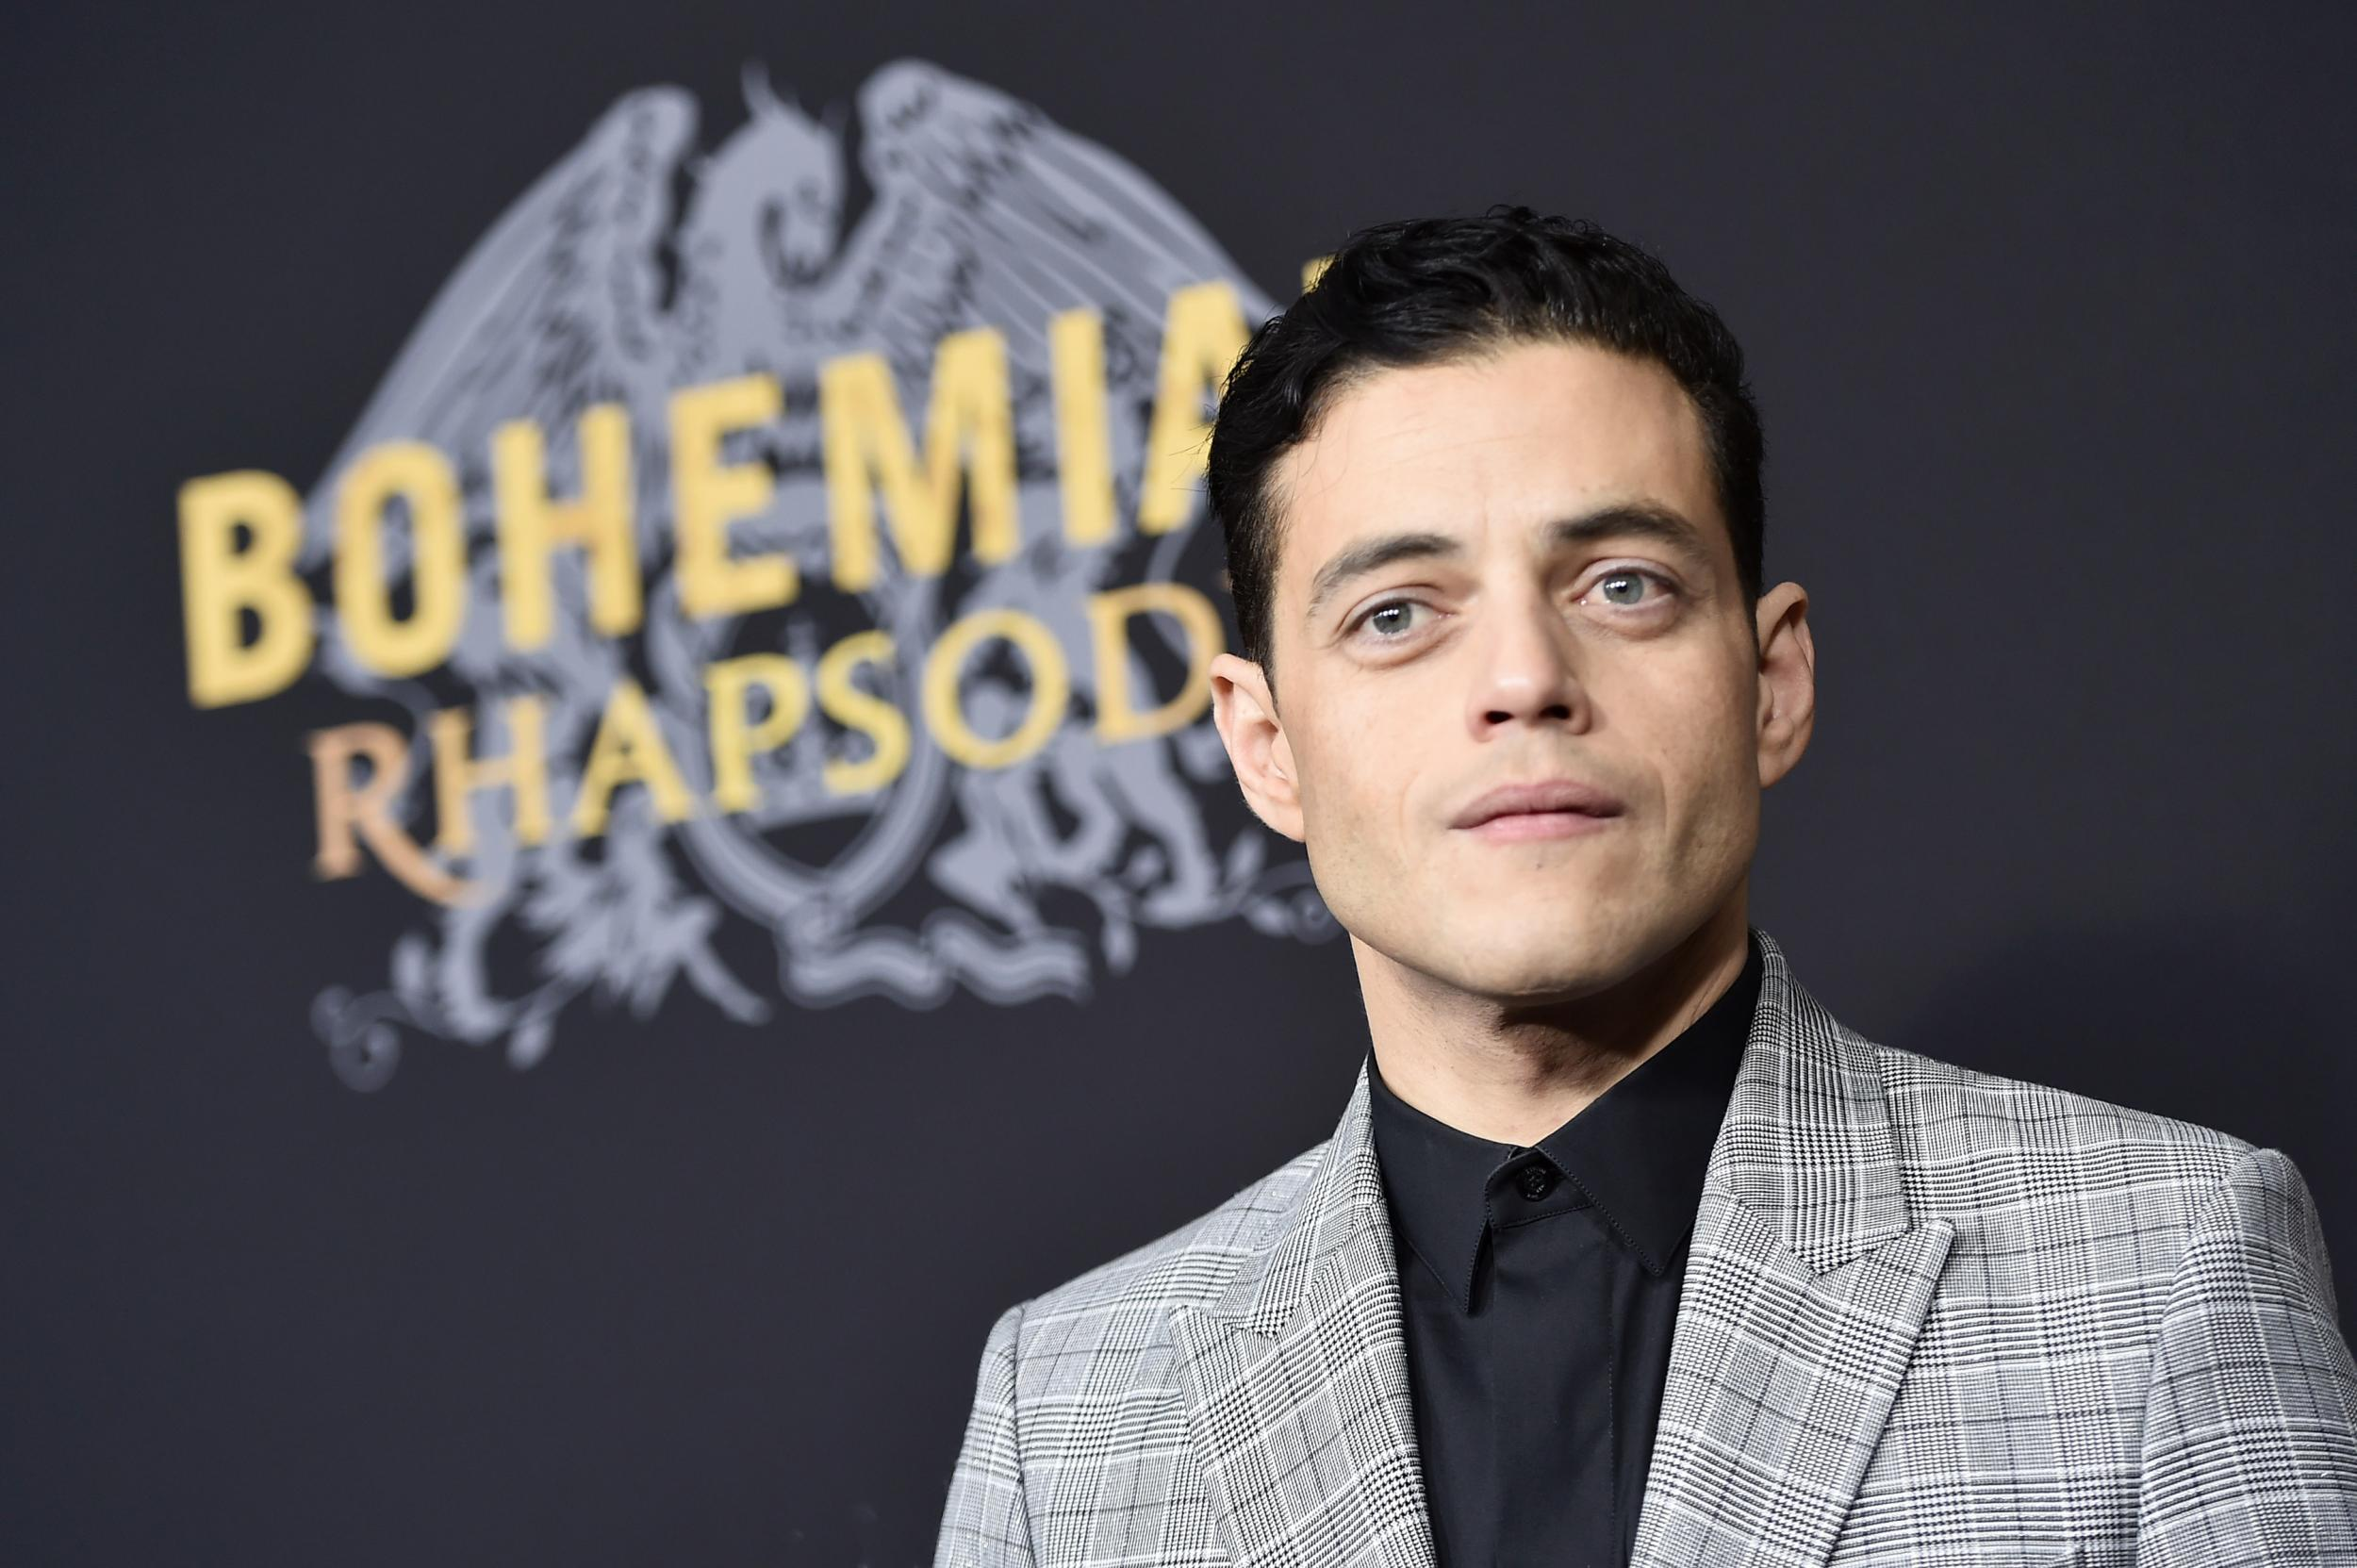 Bohemian Rhapsody actor Rami Malek teases playing James Bond's next villain